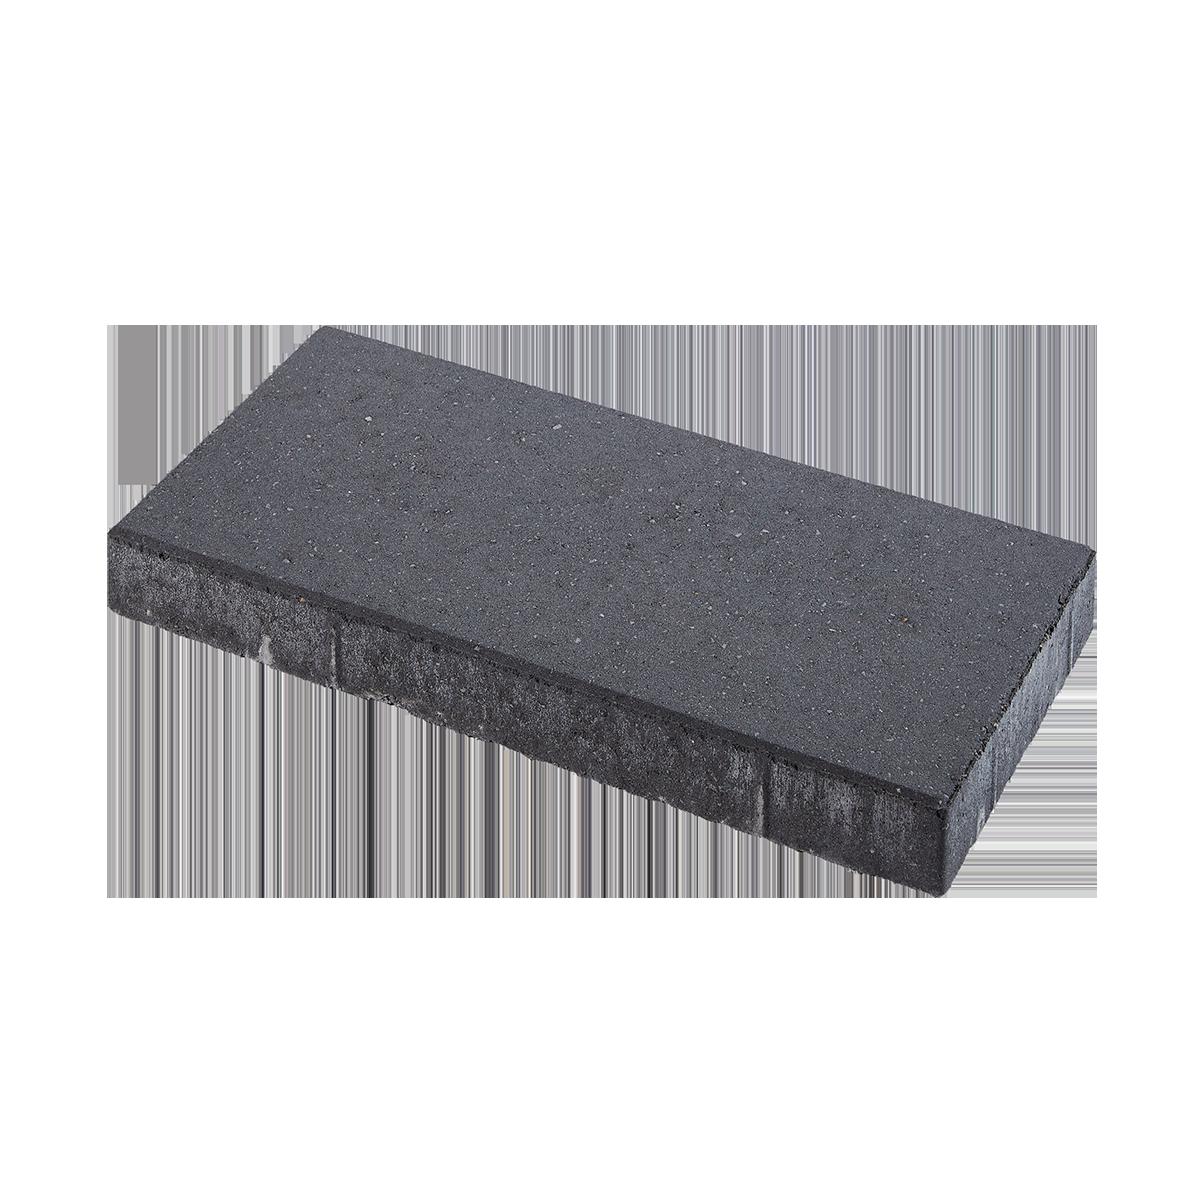 Fliser 30x60x8 cm Sort/Antracit